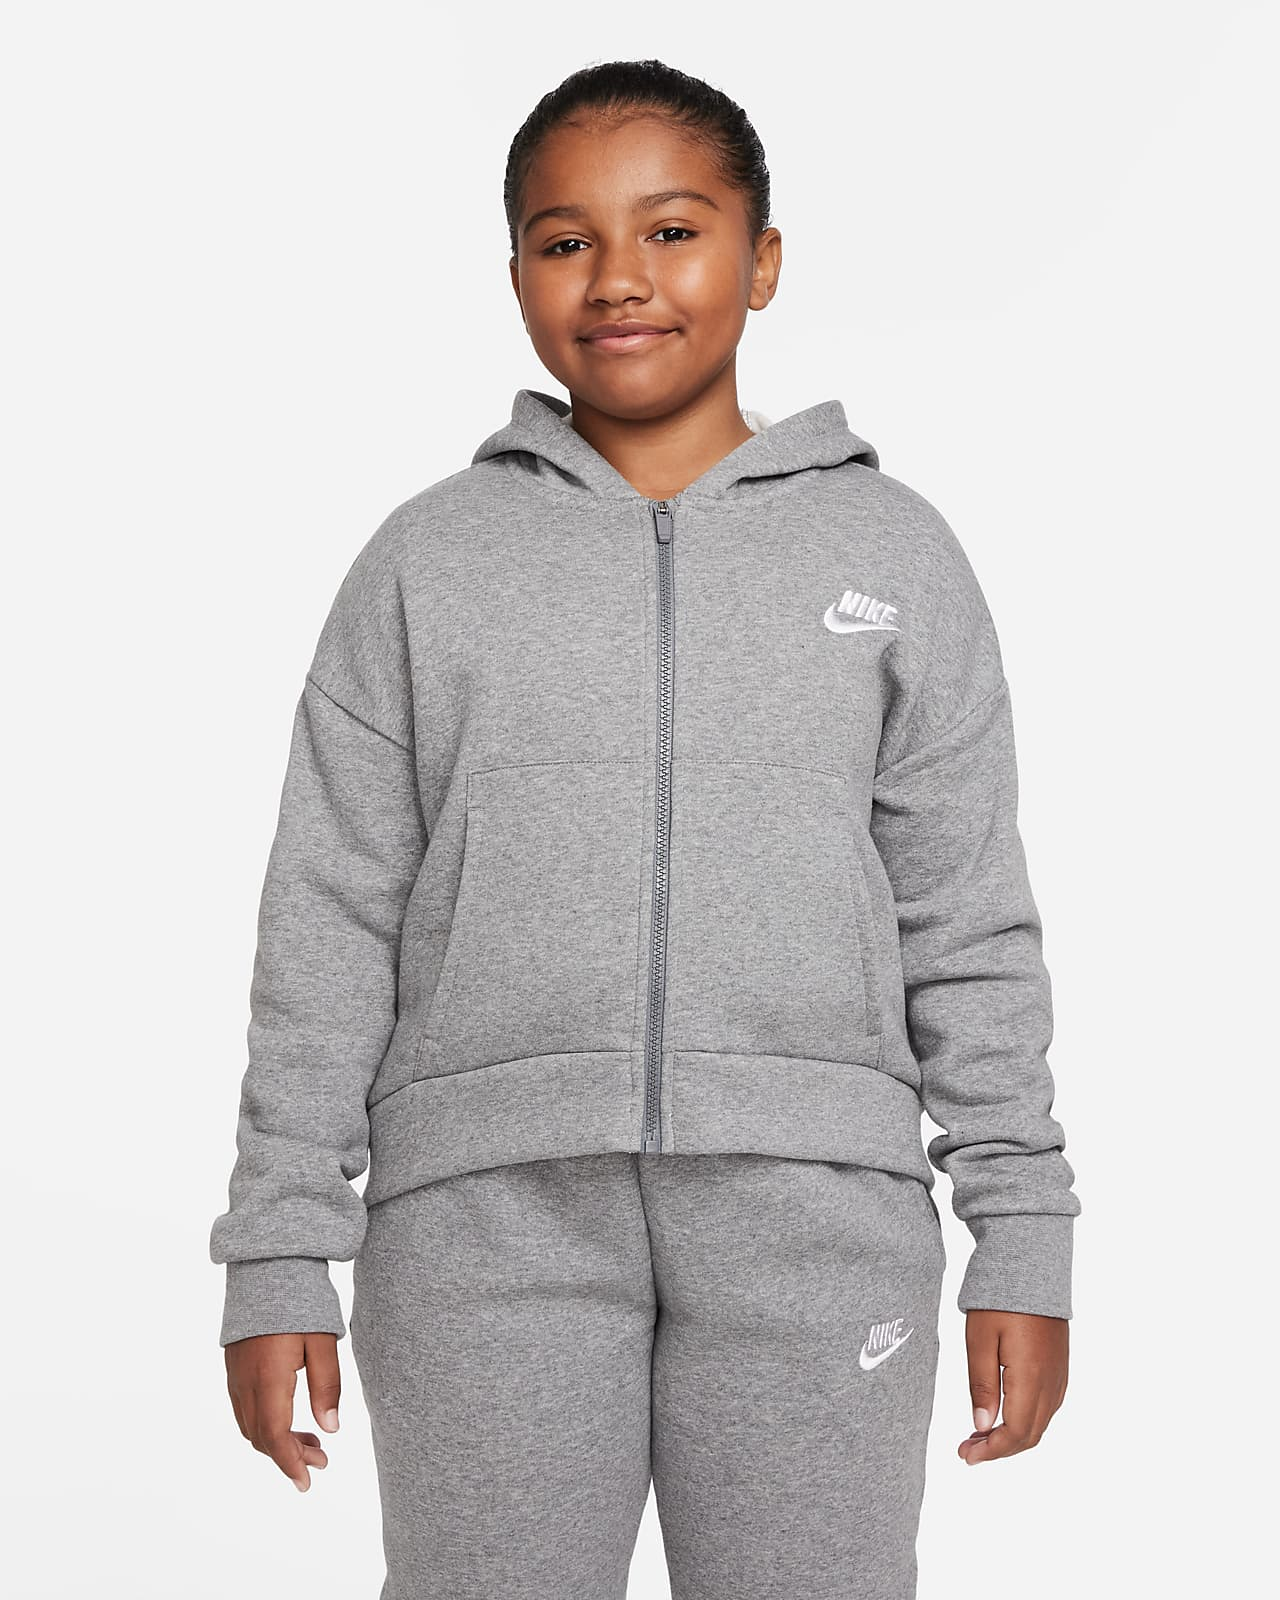 Nike Sportswear Club Fleece Dessuadora amb caputxa i cremallera completa (talles grans) - Nena